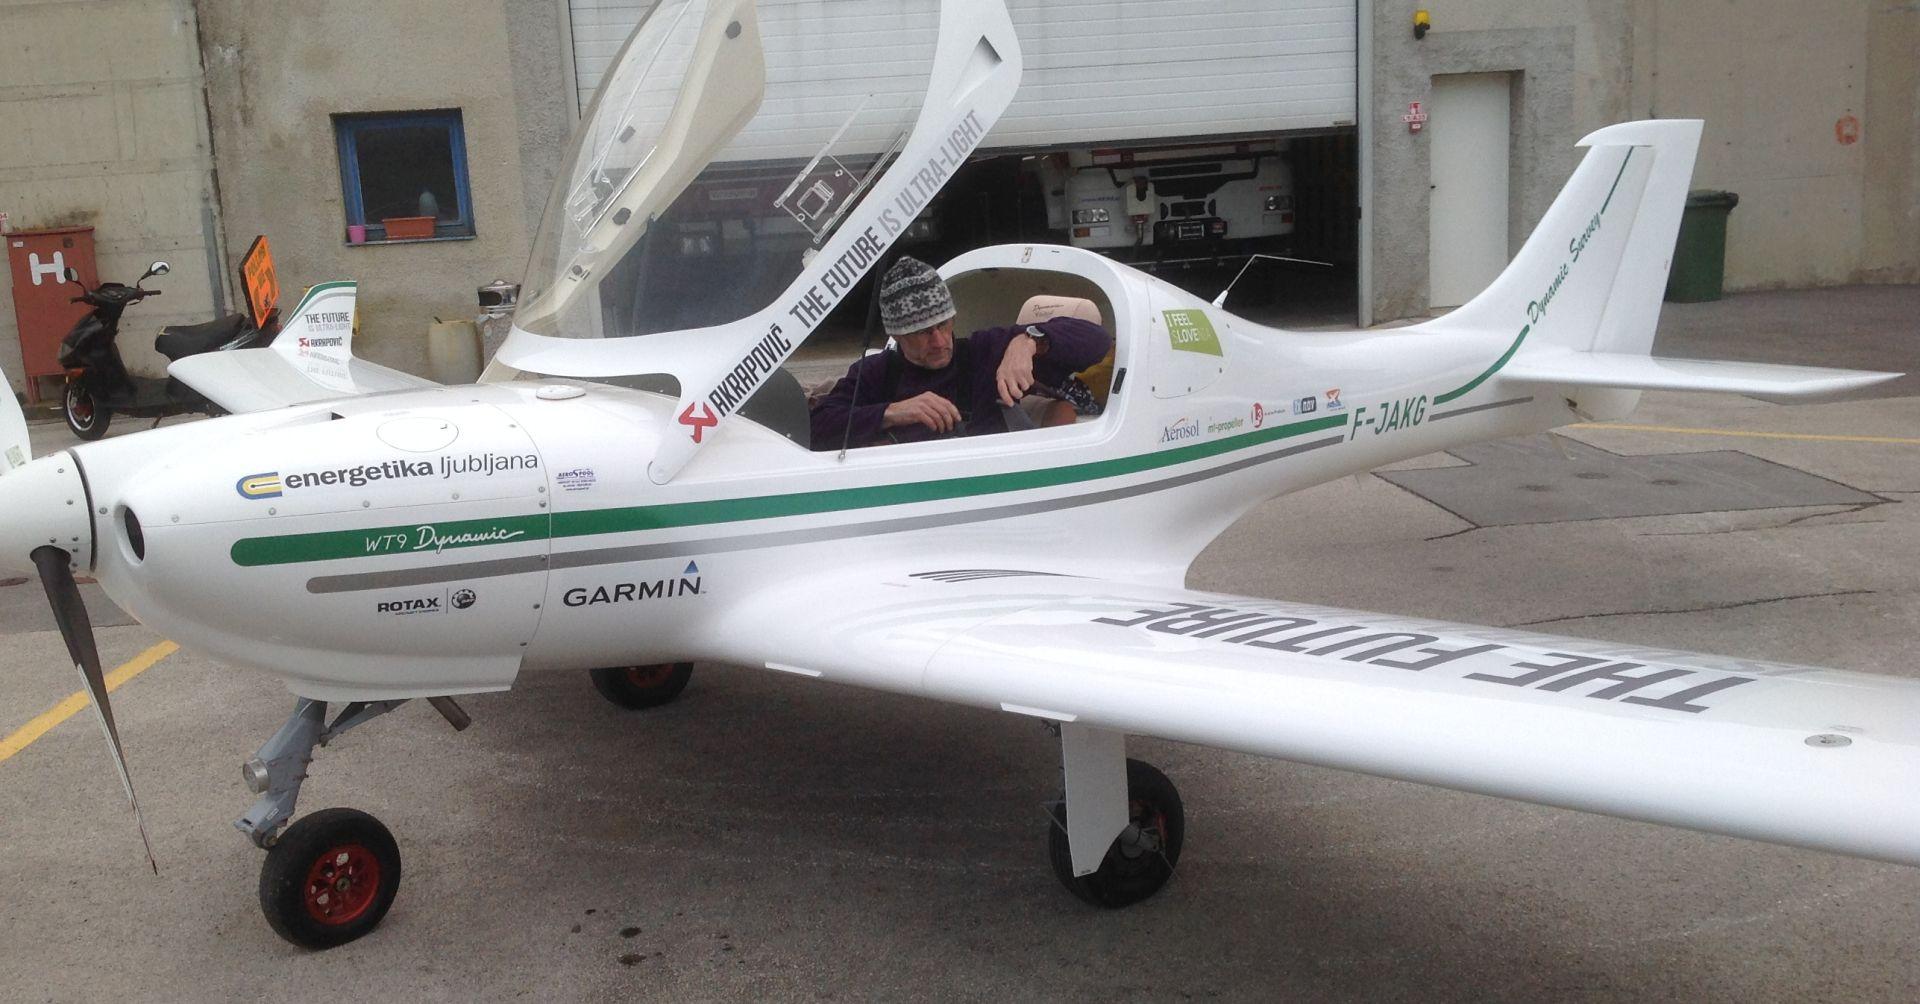 Slovenski pilot Matevž Lenarčič jutros poletio iz Portoroža na put oko svijeta